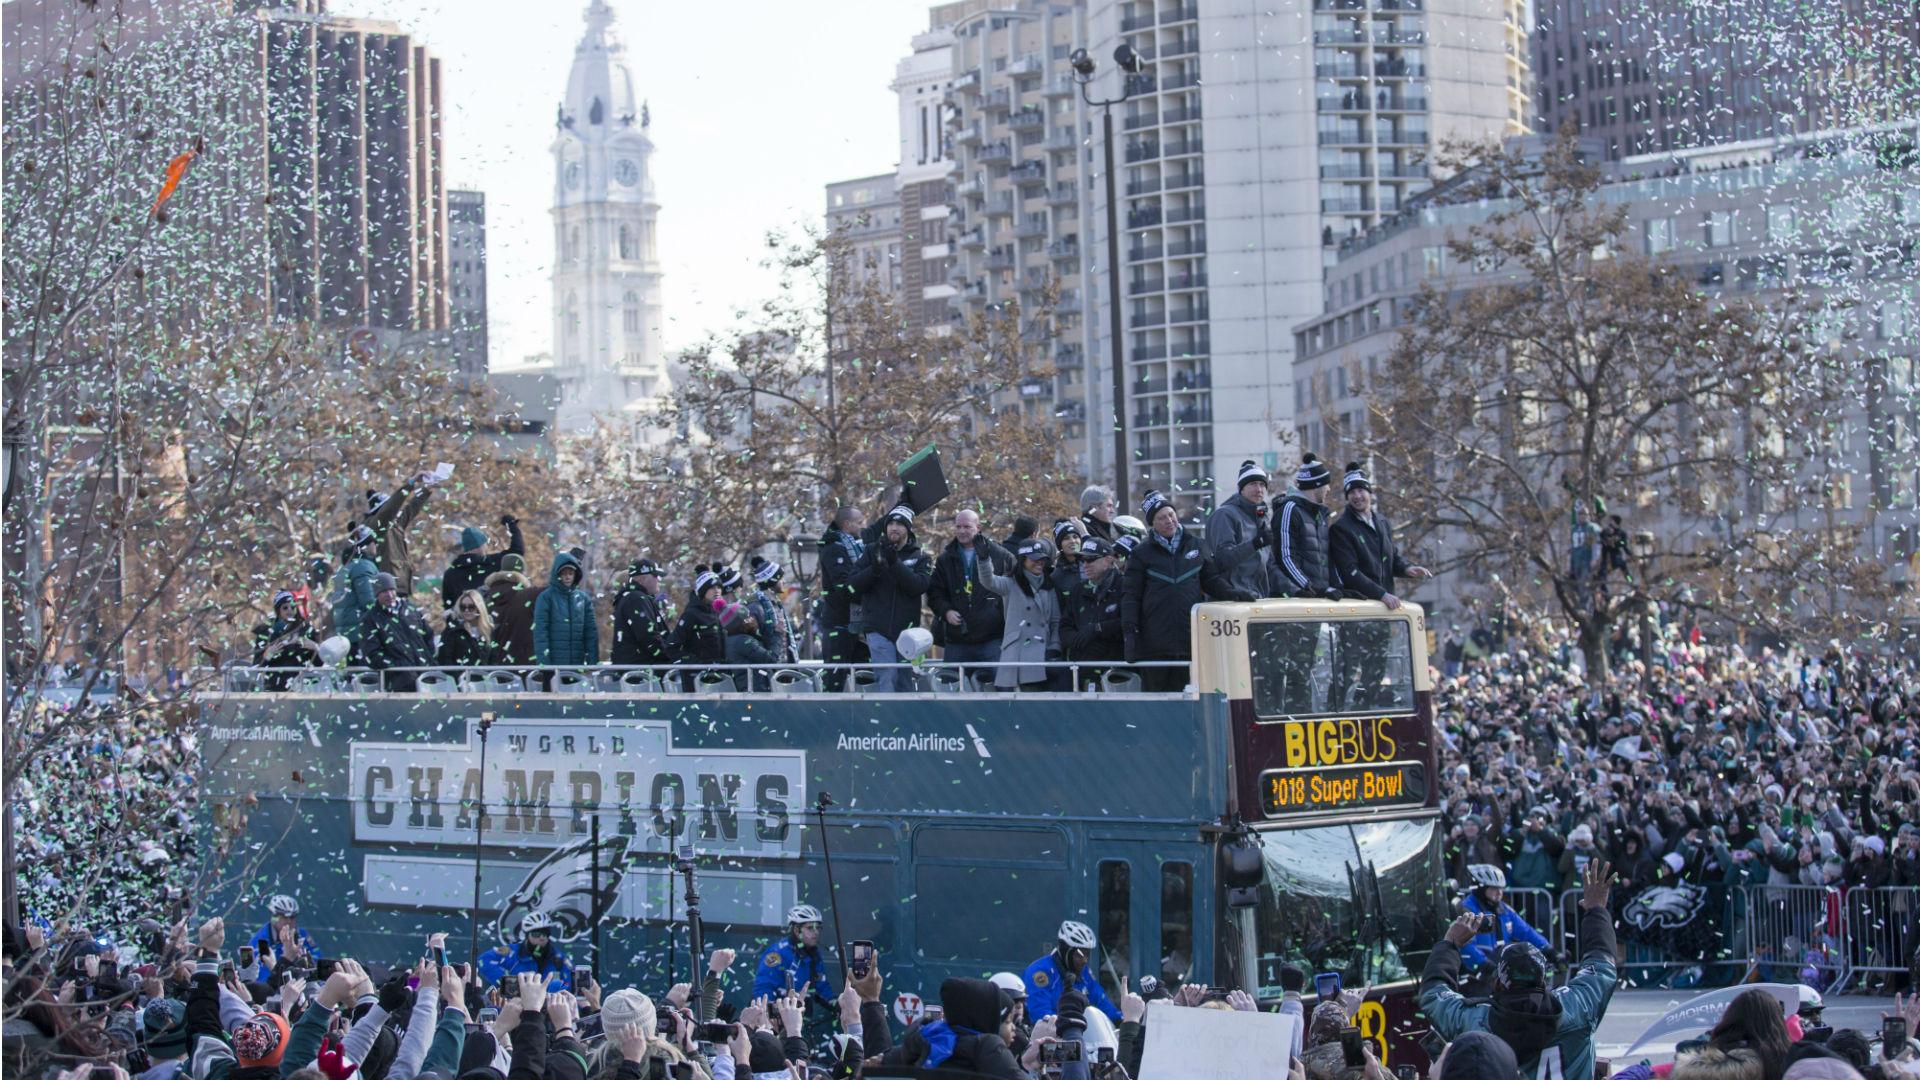 Scenes From The Eagles Super Bowl Parade In Philadelphia